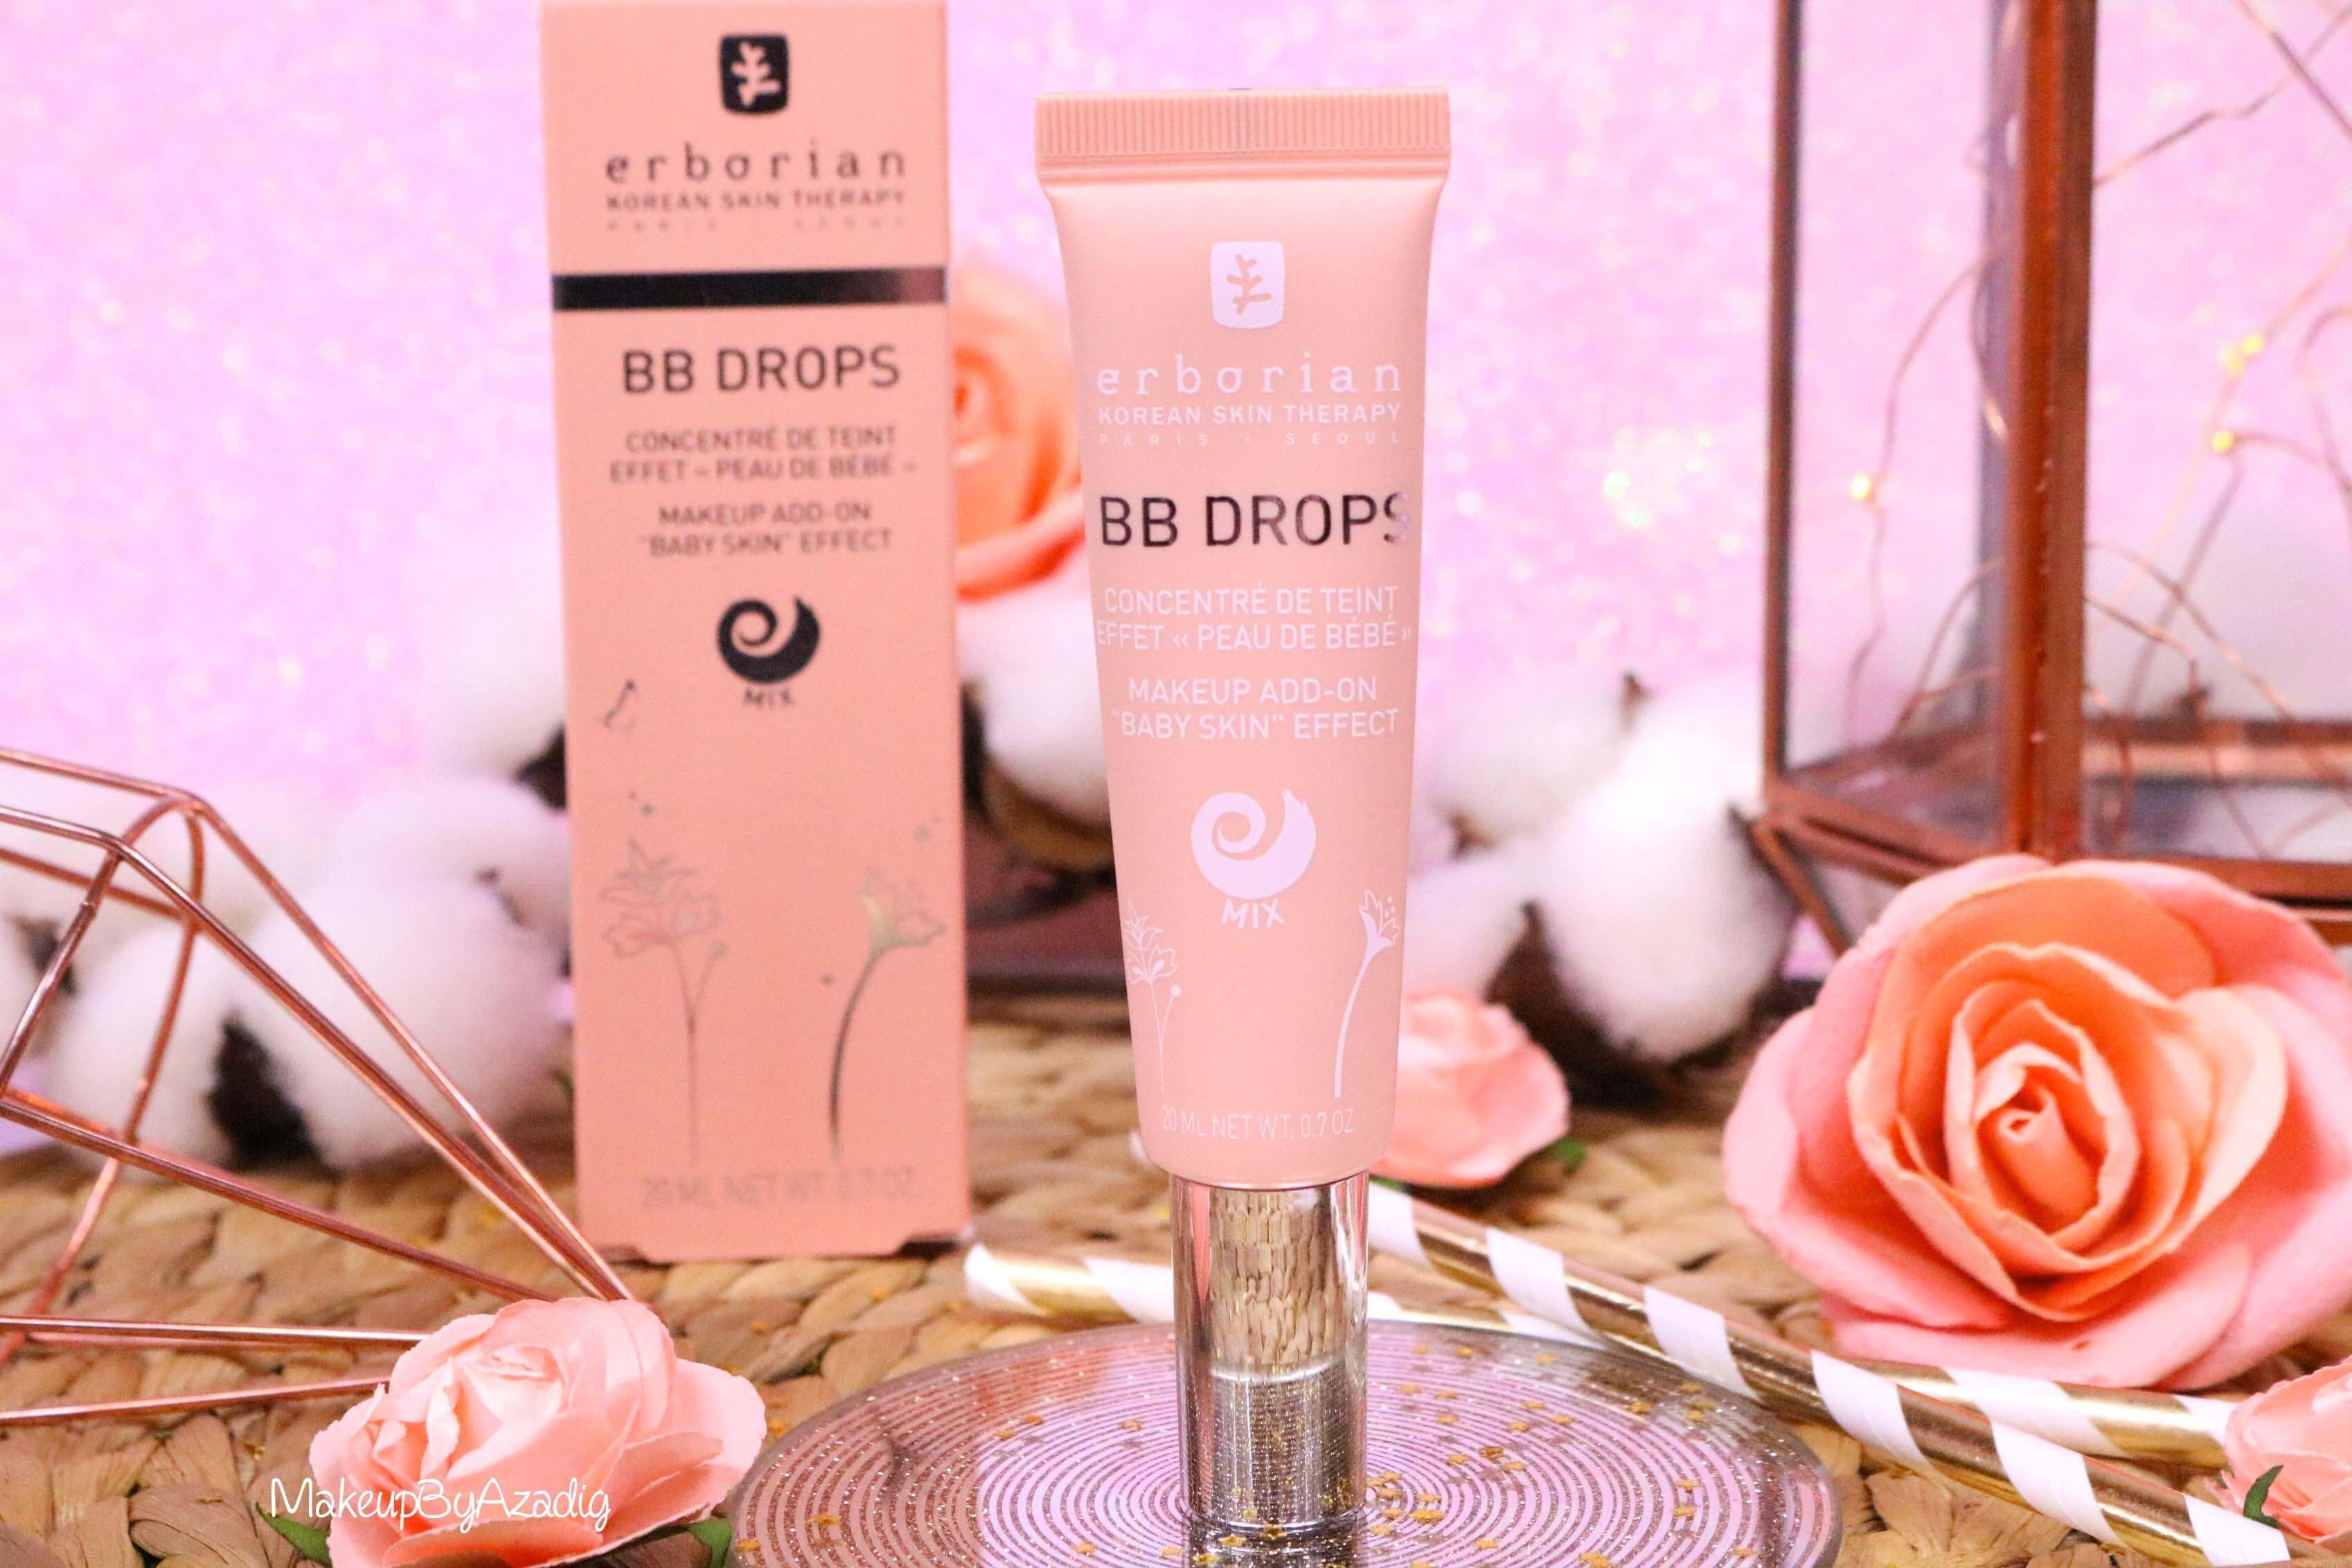 revue-bb-drops-mask-erborian-sephora-teint-parfait-de-bebe-avis-prix-swatch-makeupbyazadig-nouveaute-tube